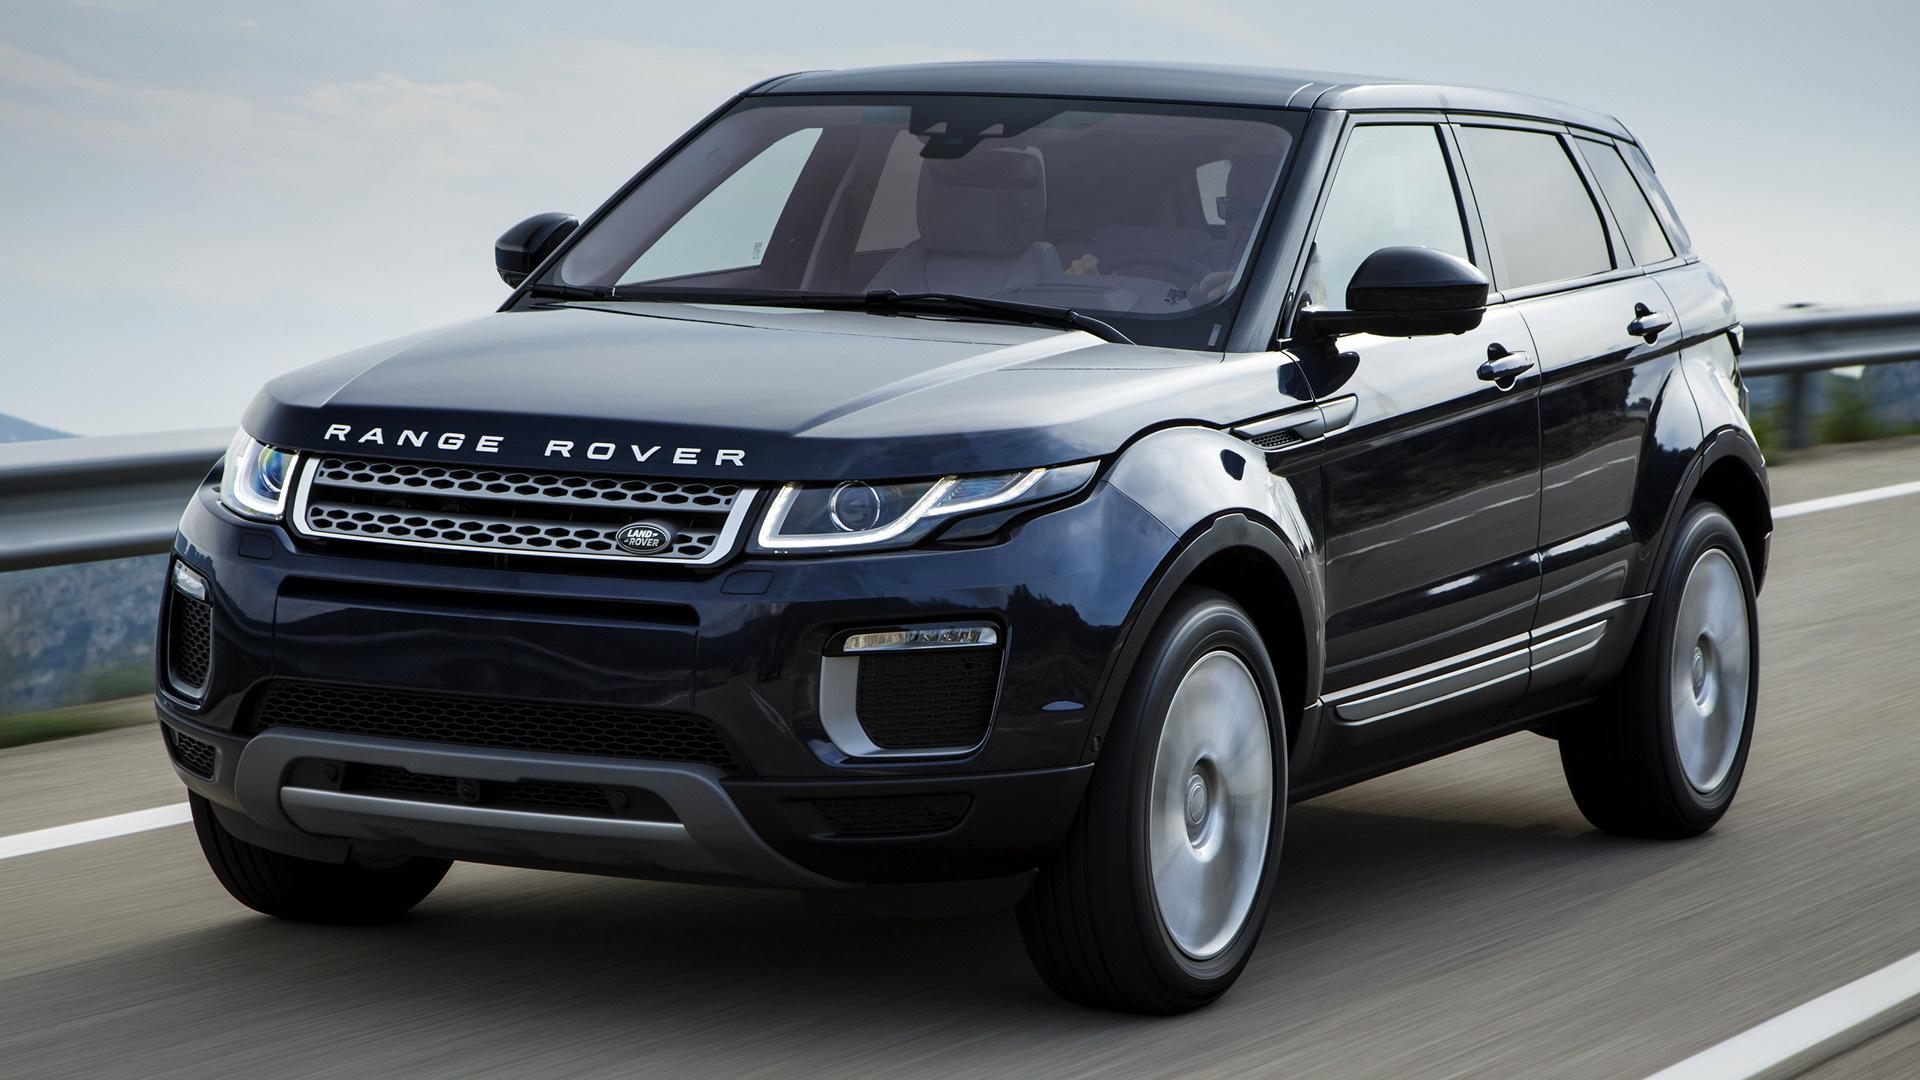 range rover evoque 2015 wallpapers and hd images car pixel. Black Bedroom Furniture Sets. Home Design Ideas